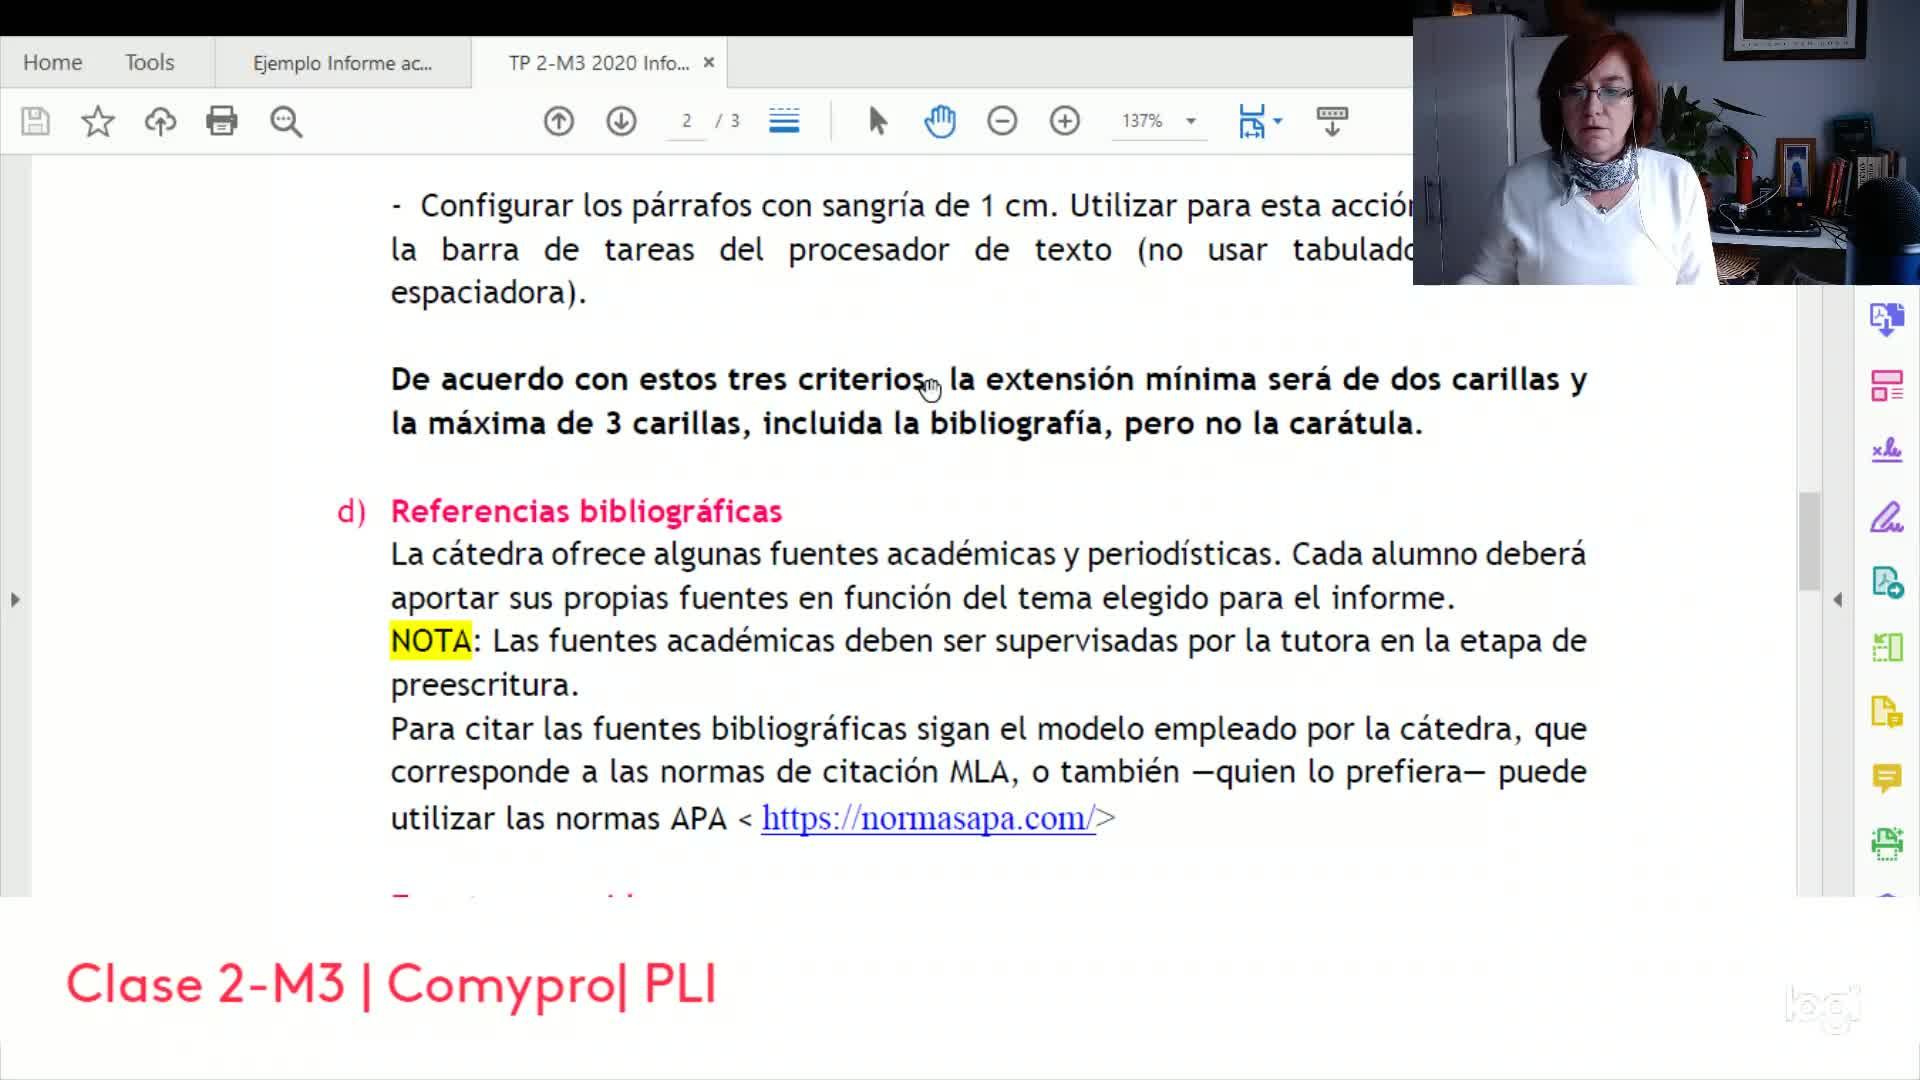 ProfesoradoLLC_COMYPRO_Svensson_M3-Clase 2